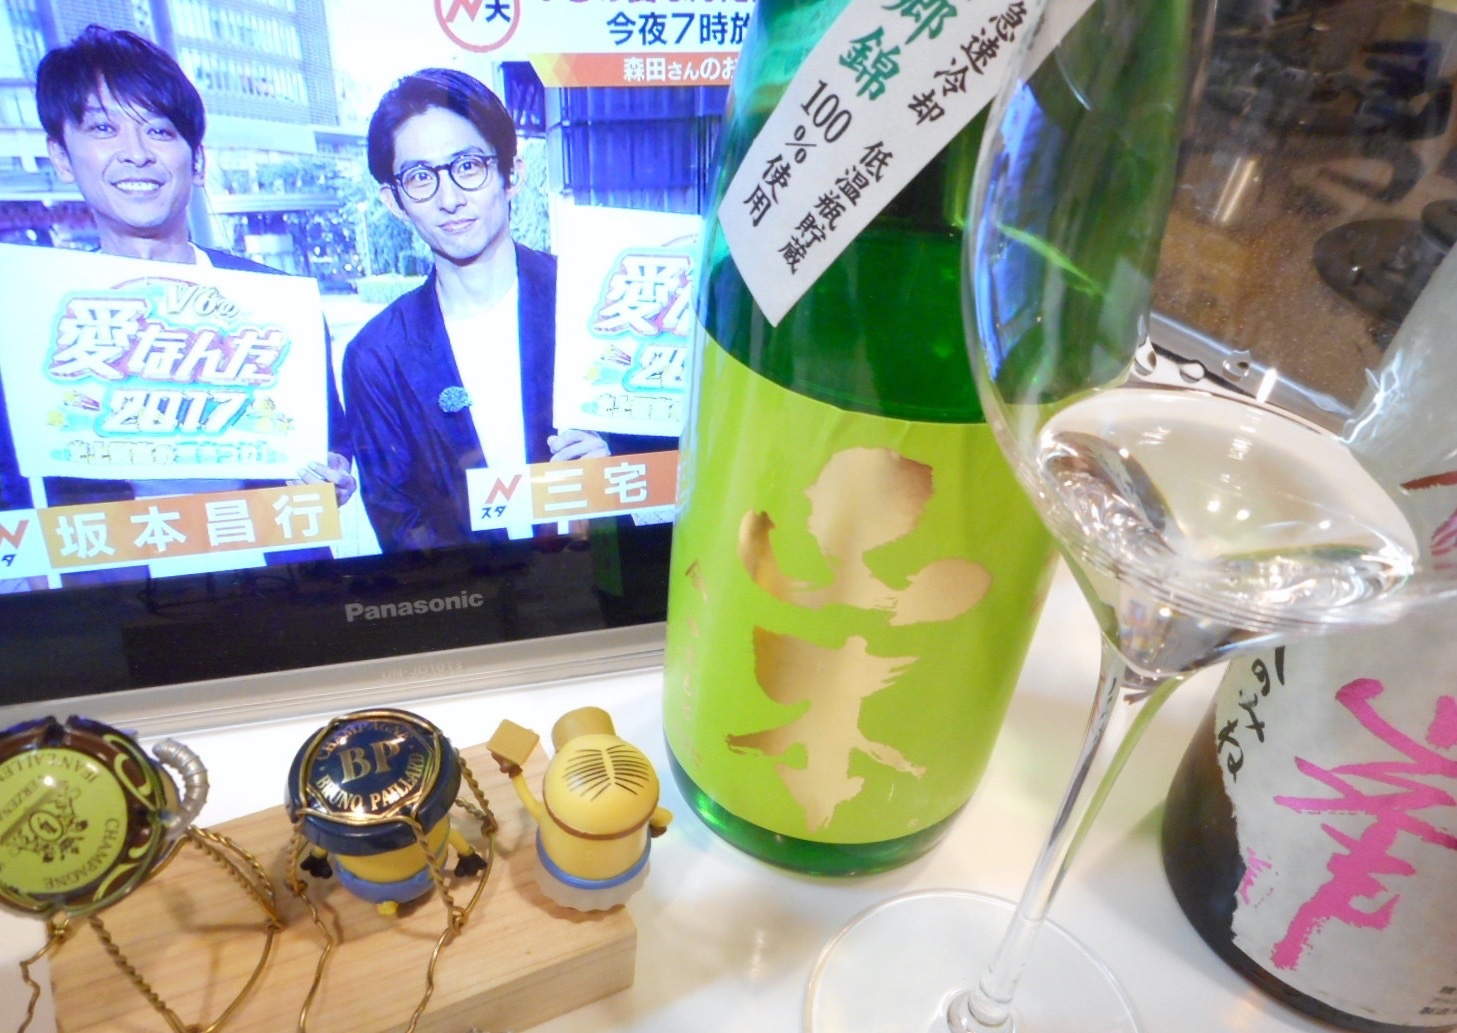 yamamoto_misatonishiki55_28by8.jpg